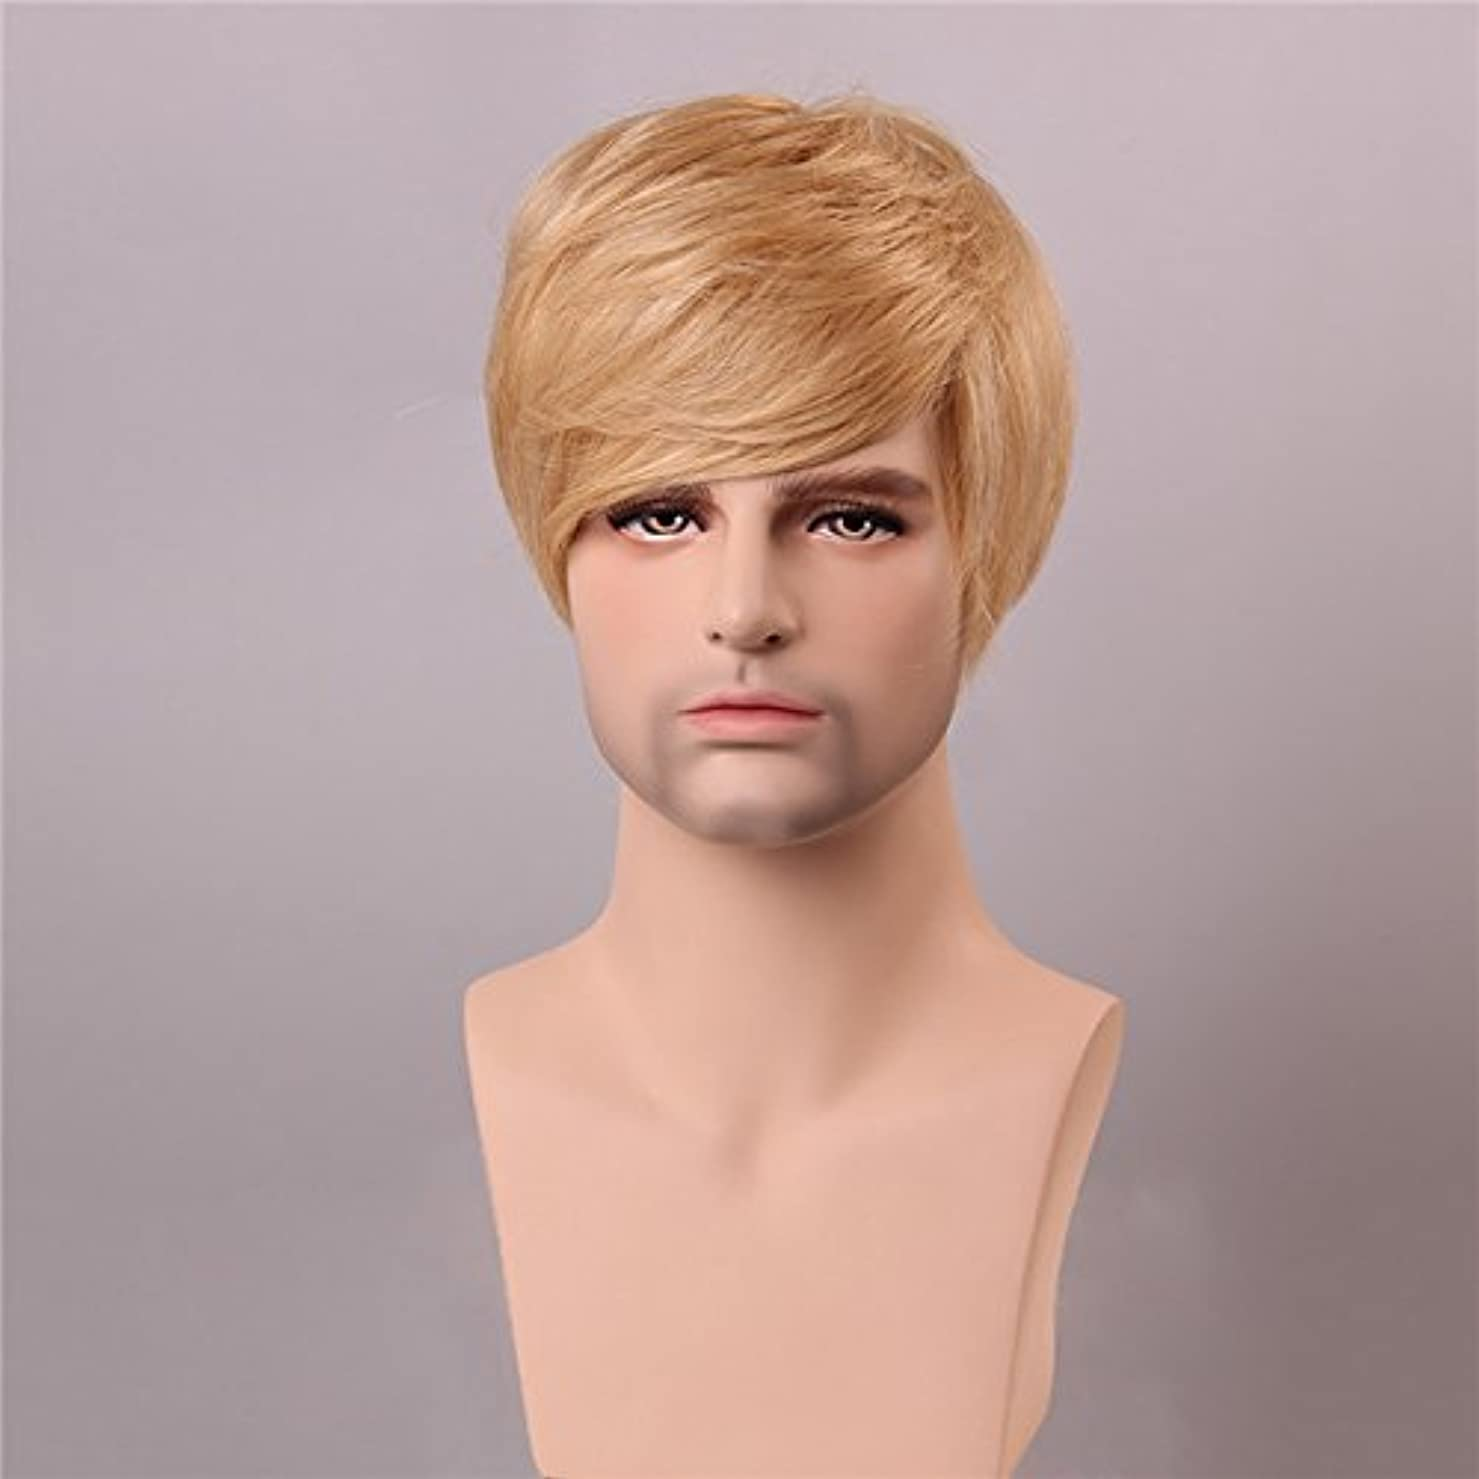 YZUEYT ブロンドの男性短いモノラルトップの人間の髪のかつら男性のヴァージンレミーキャップレスサイドバング YZUEYT (Size : One size)